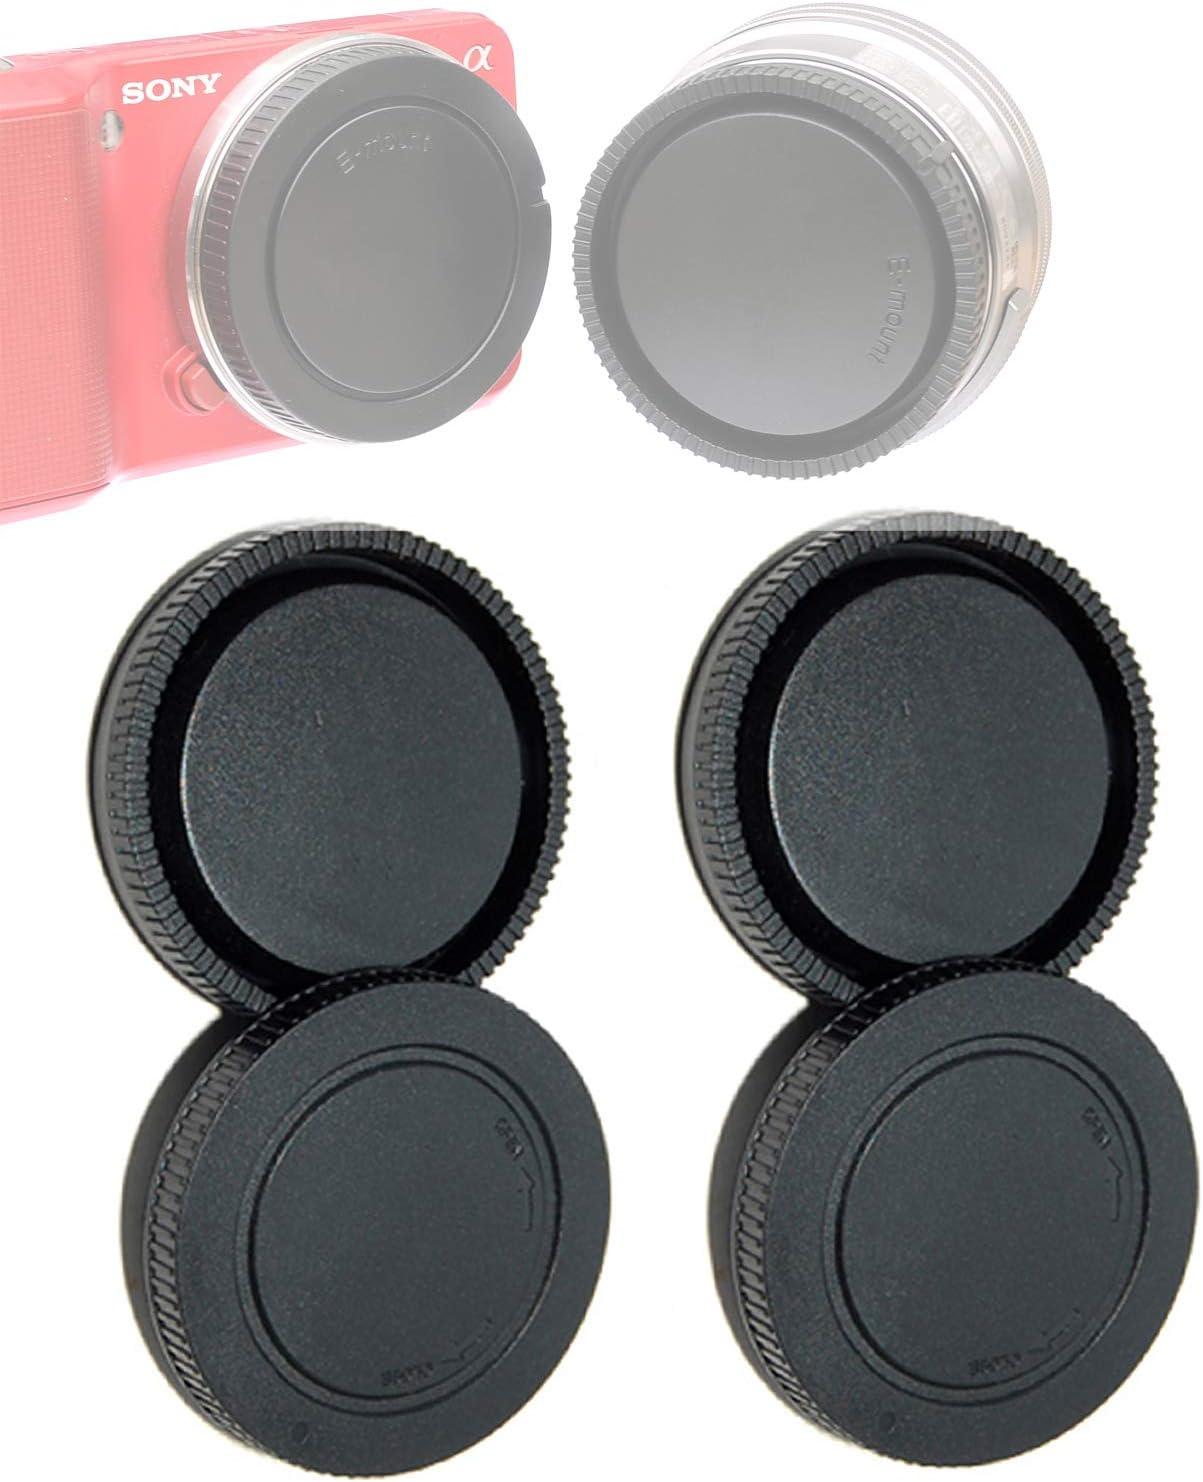 2 Packs Manufacturer OFFicial Spring new work shop E Mount Rear Back Sony Cap Camer EMount Body Lens